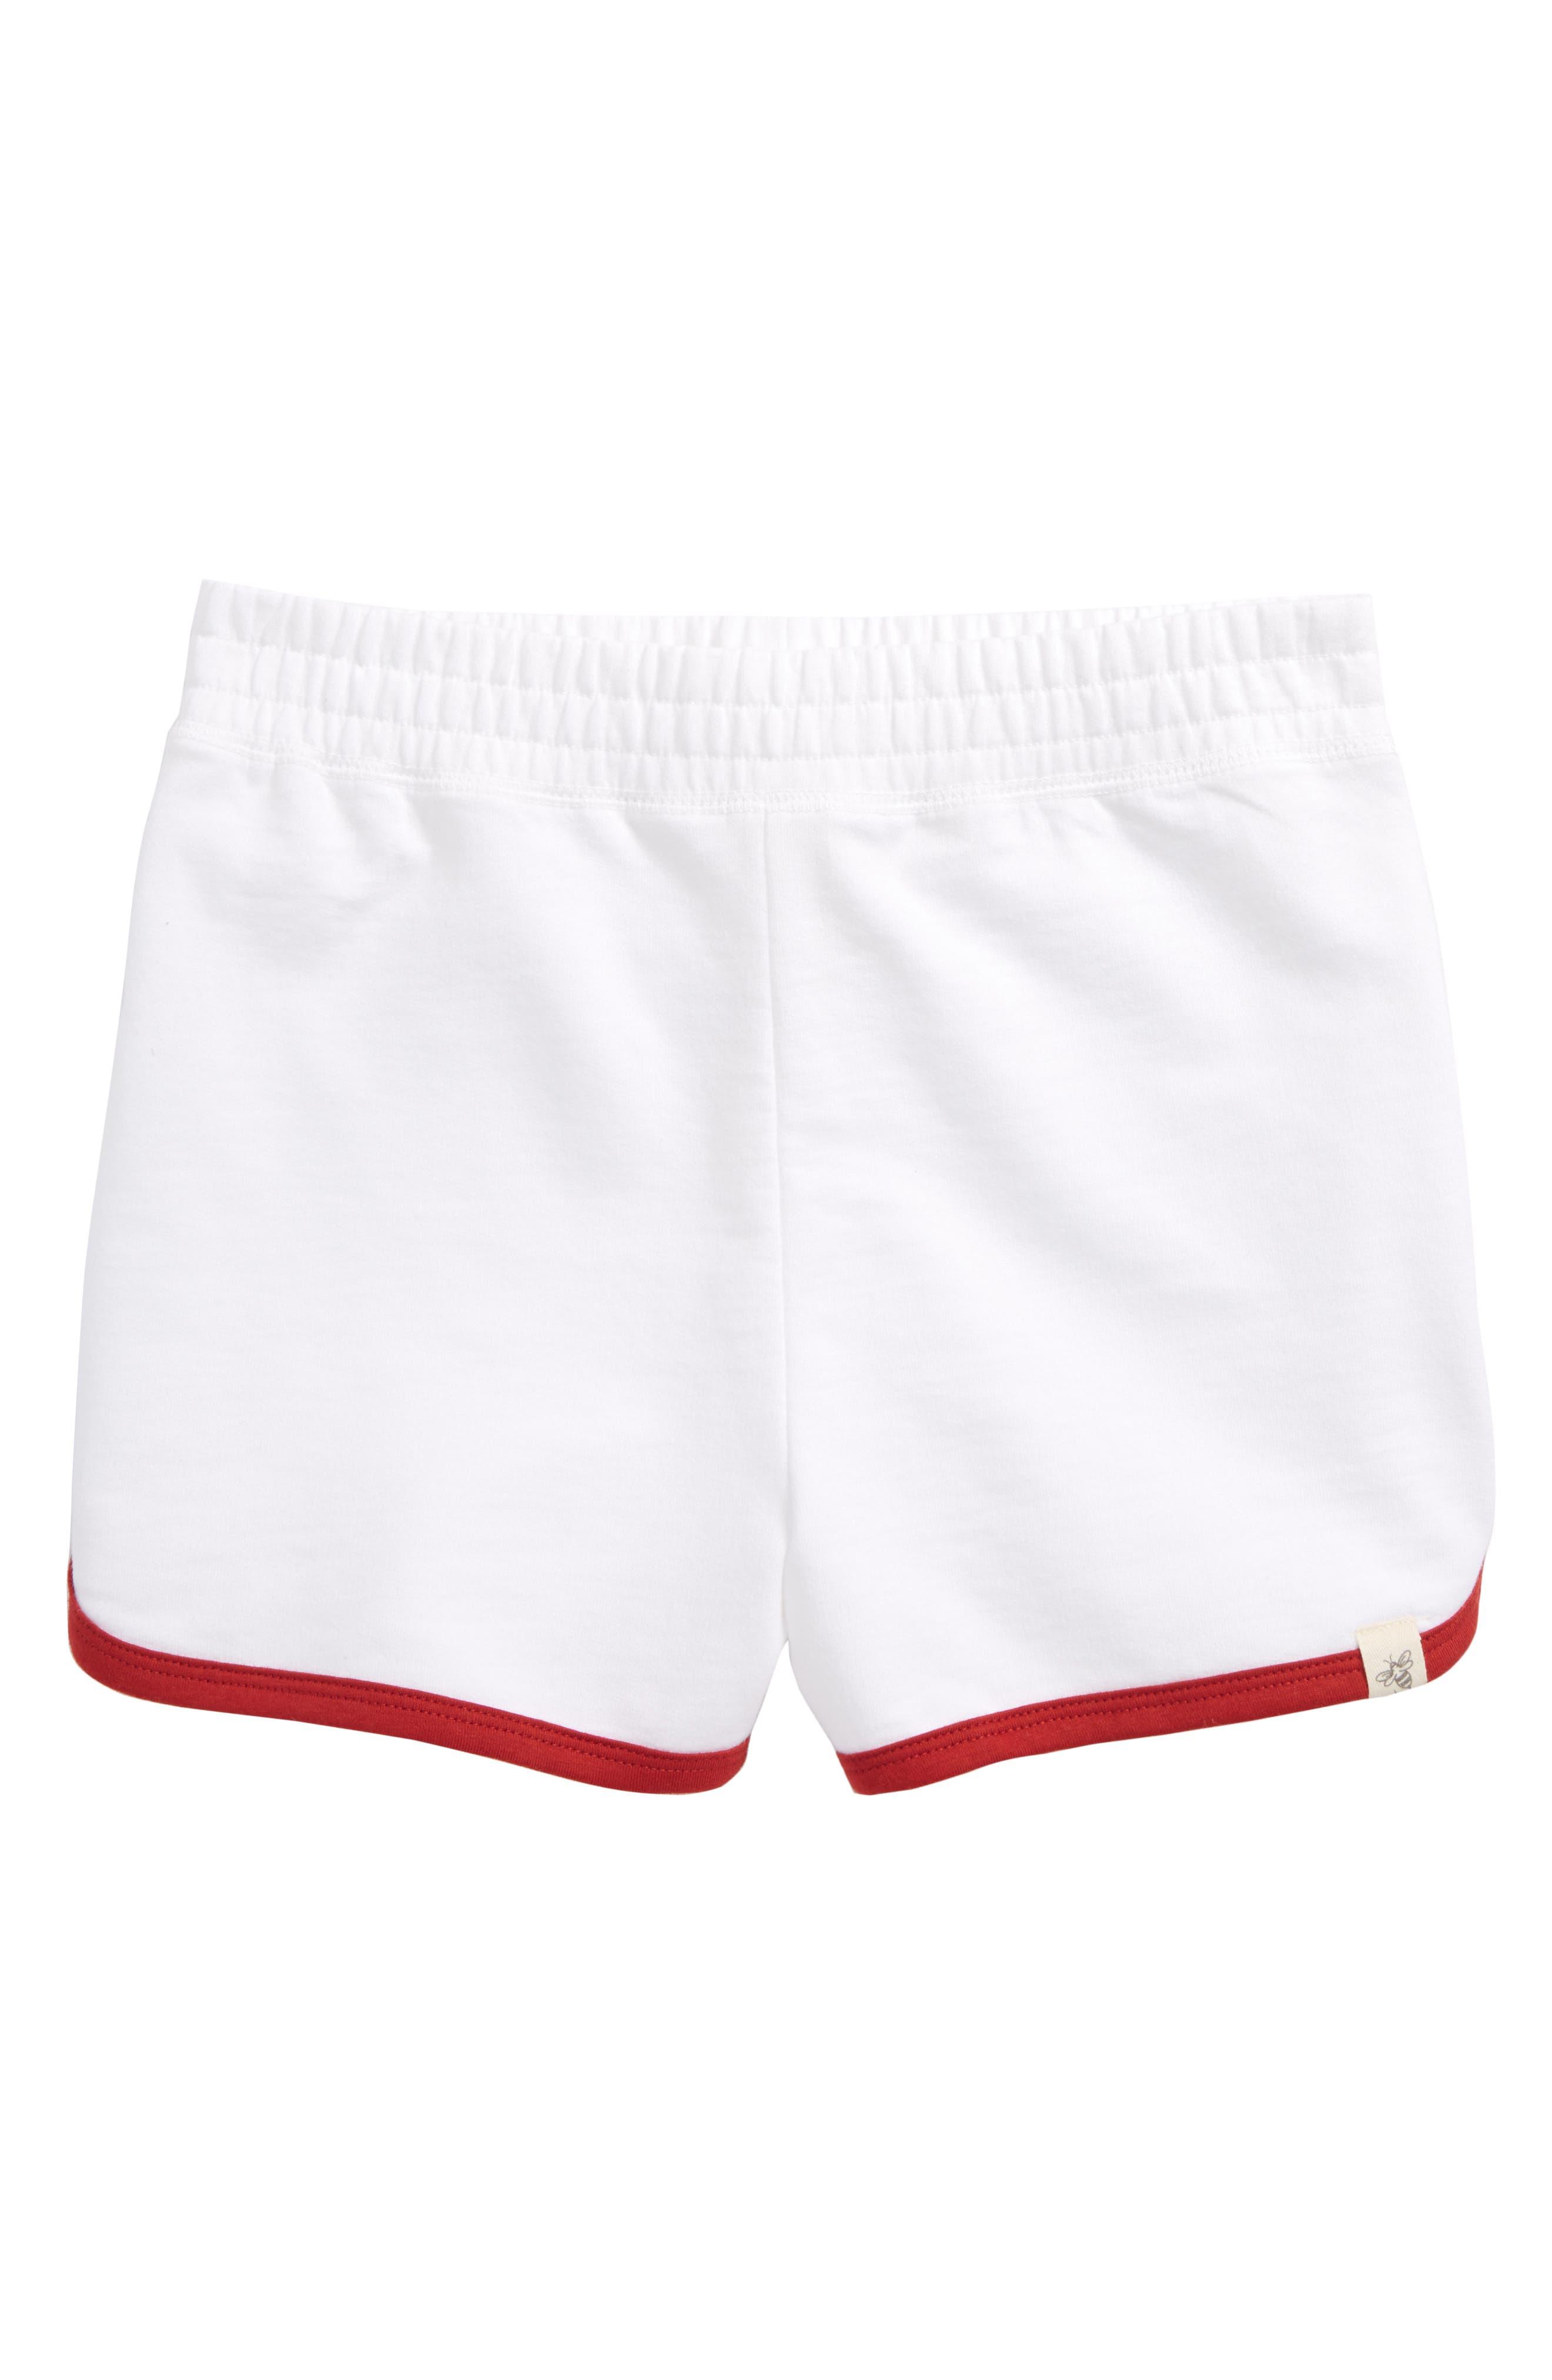 Organic Cotton Shorts,                             Main thumbnail 1, color,                             Cloud